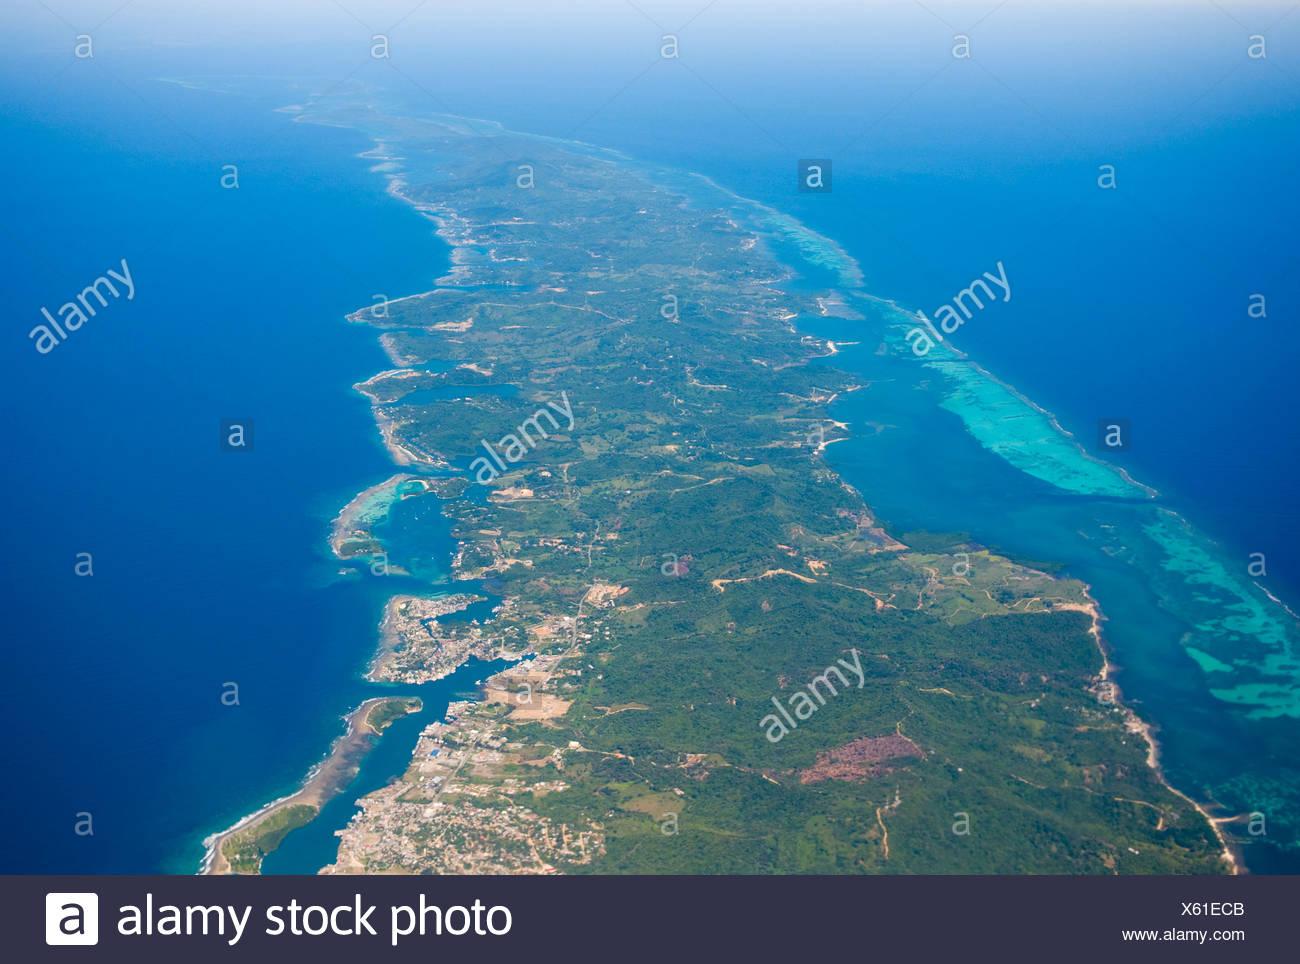 Eastern part of Roatan, French Harbour, Honduras, Caribbean - Stock Image